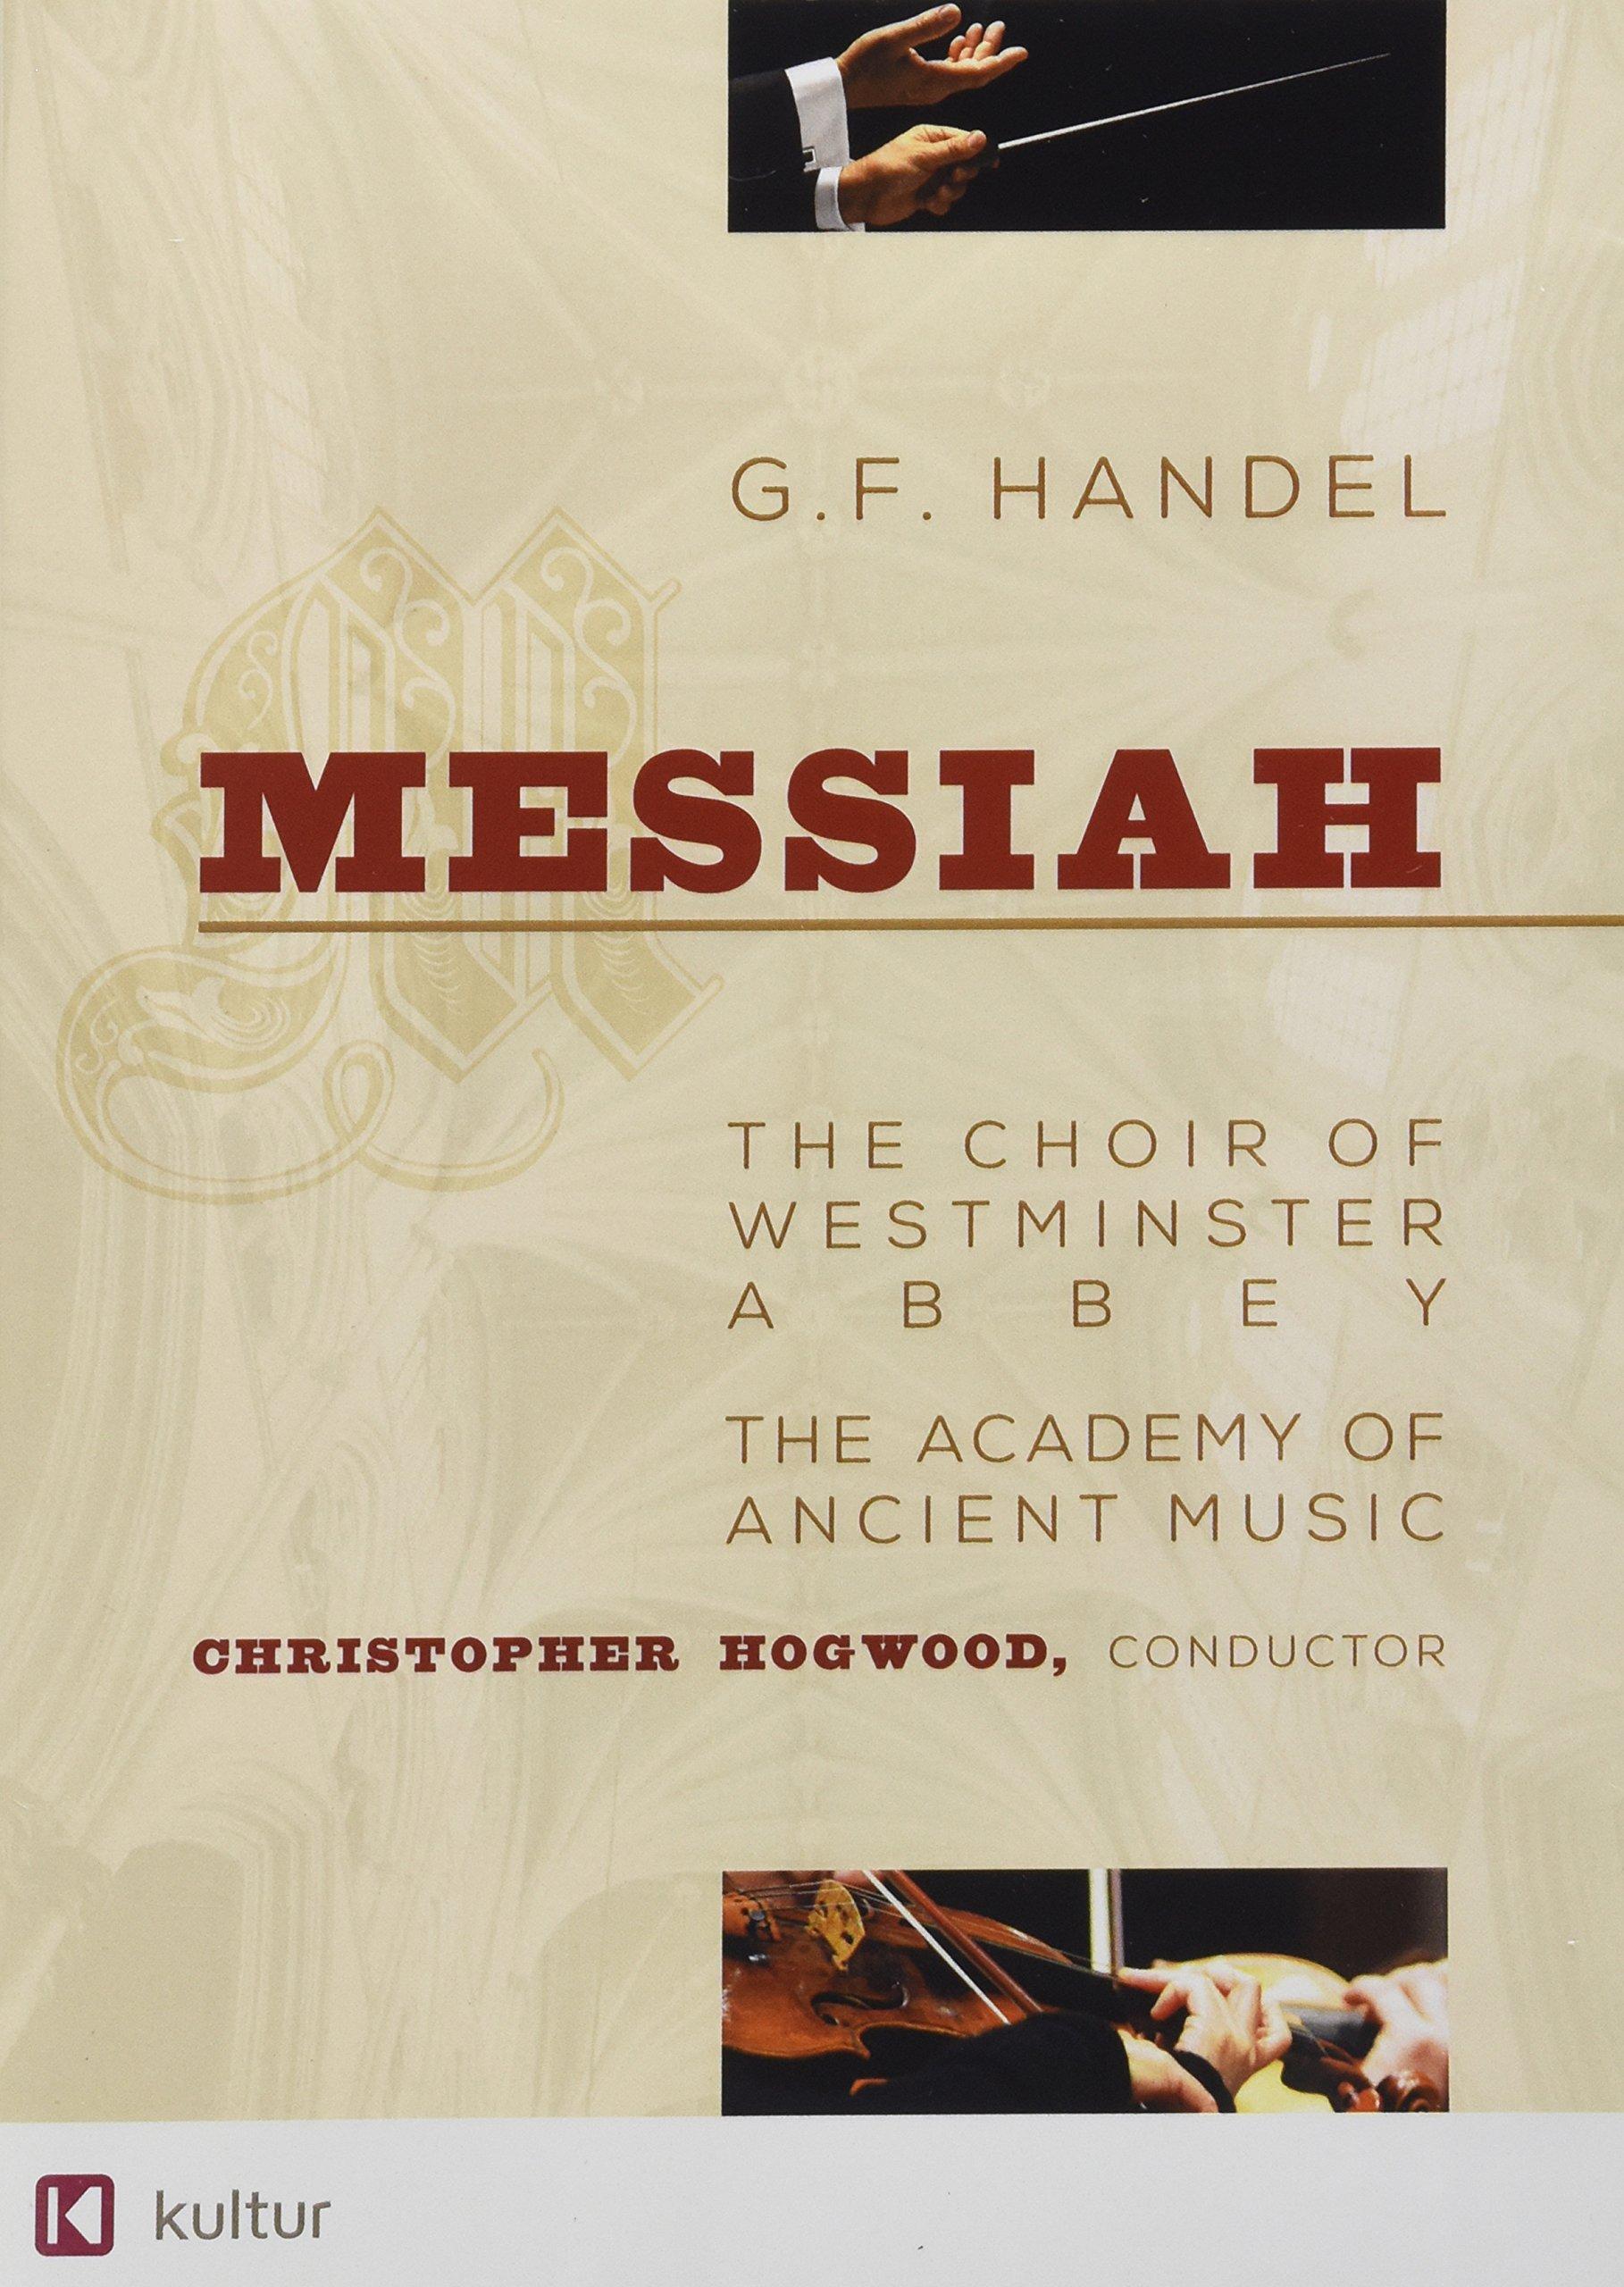 Handel - Messiah / Emma Kirkby, Judith Nelson, Carolyn Watkinson, Paul Elliott, David Thomas, Christopher Hogwood, Academy of Ancient Music, Choir of Westminster Abbey